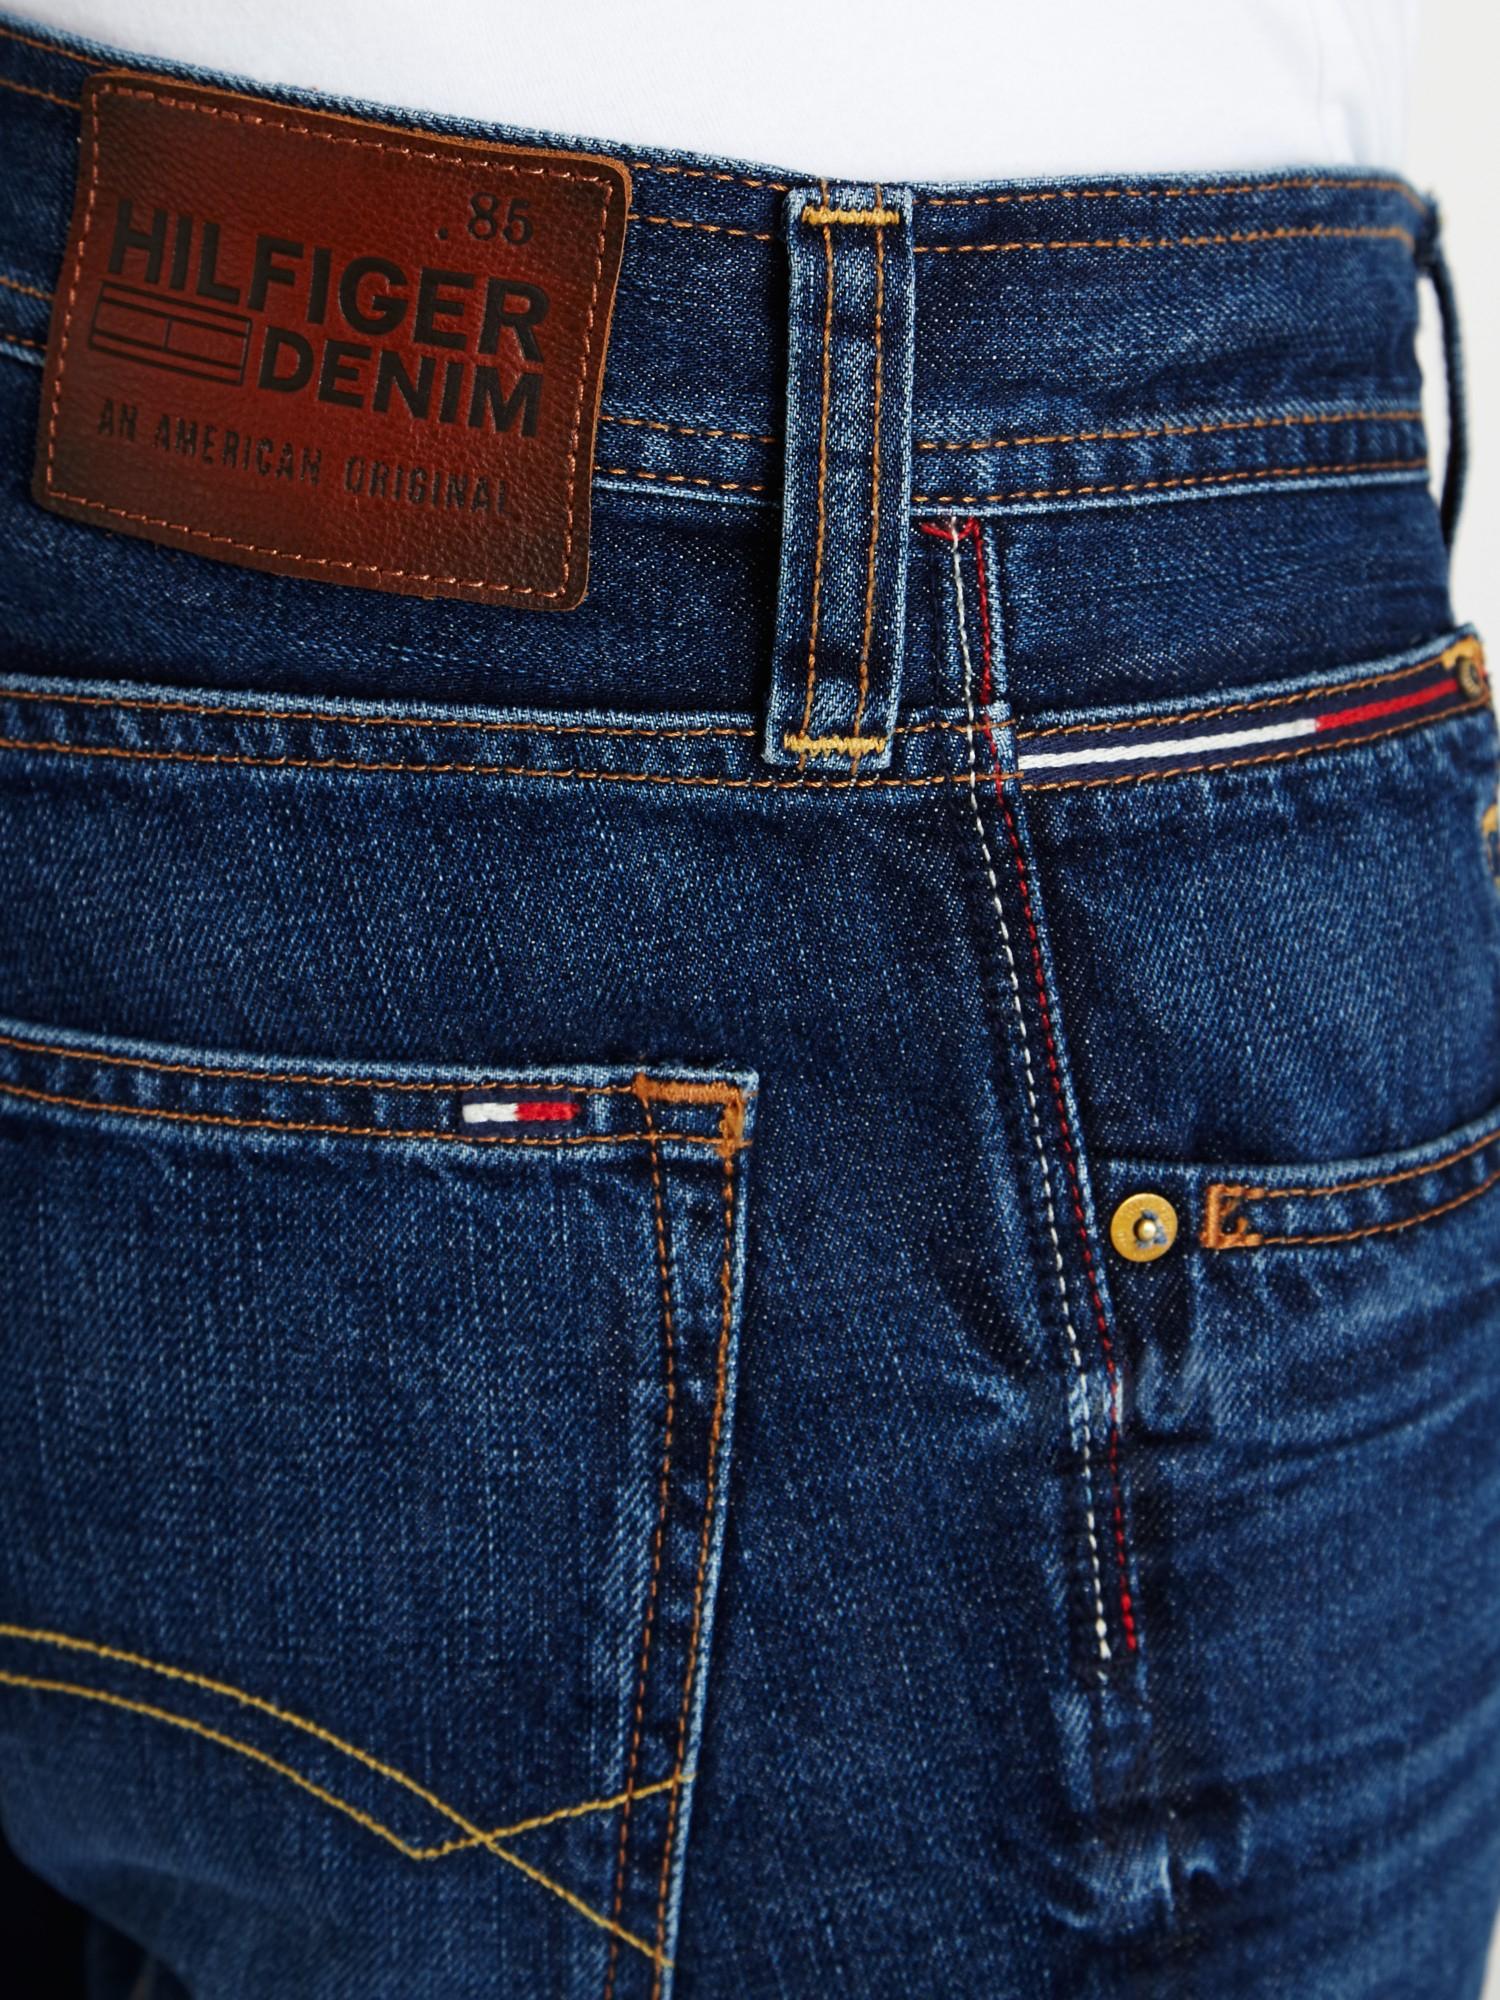 Hilfiger Denim Wilson Straight Jeans in Blue for Men - Lyst 9801616ea3